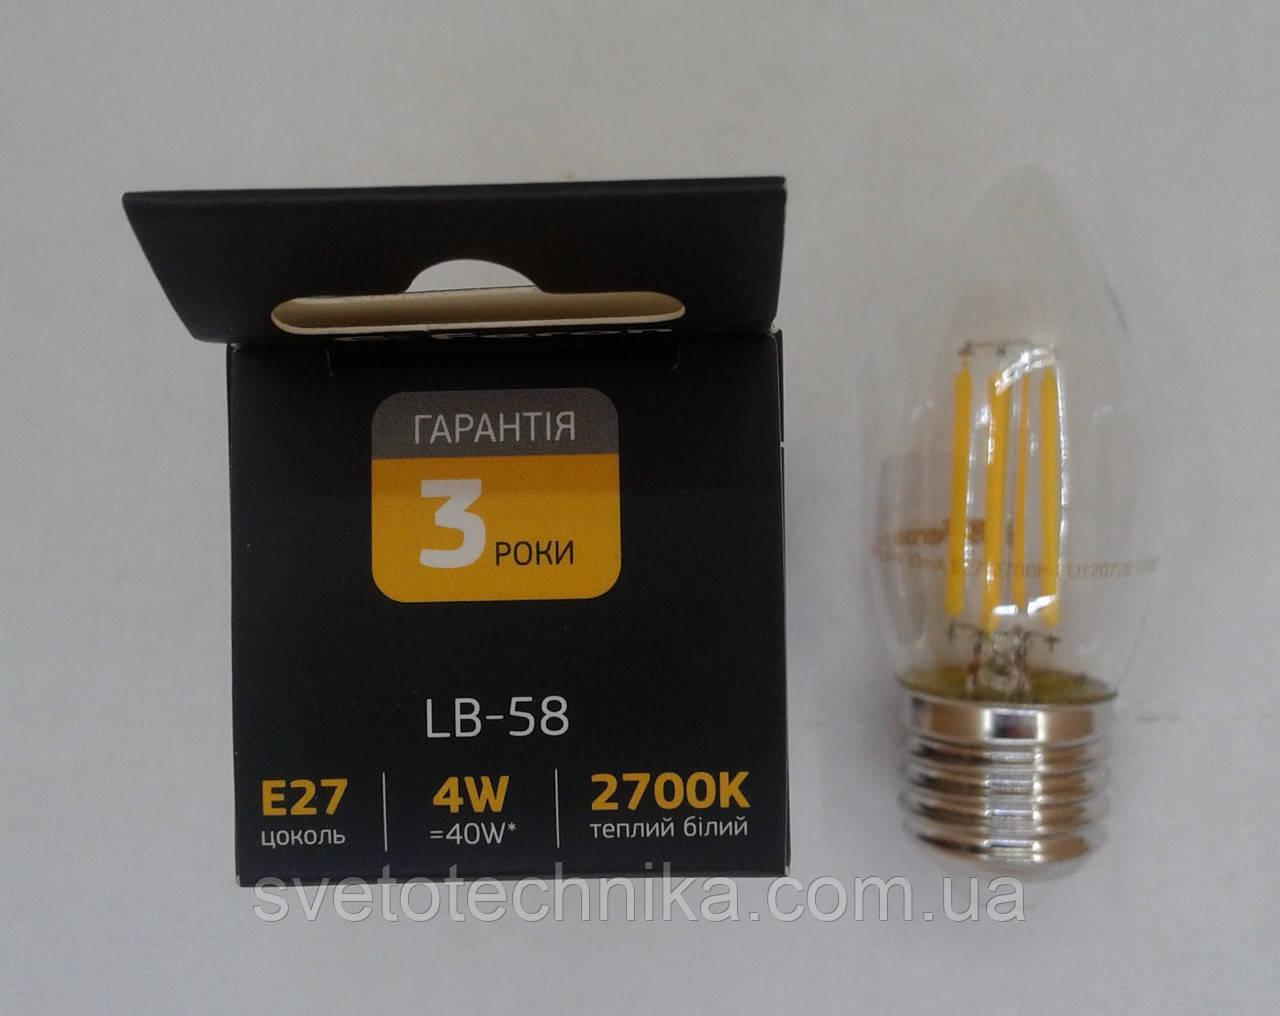 Светодиодная лампа Feron LB-58 Filament 4W E274000К